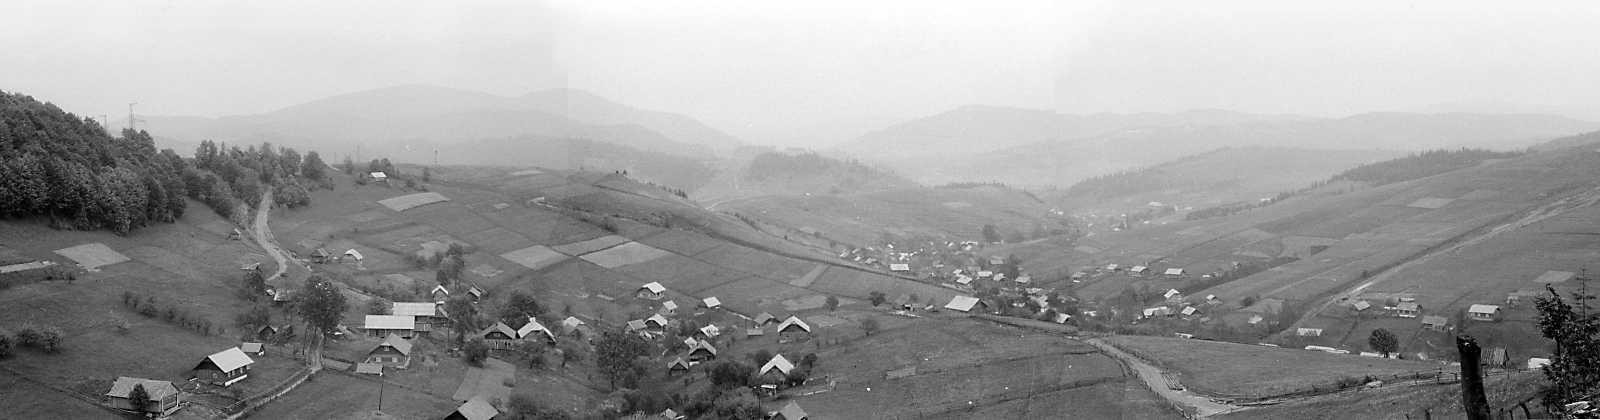 1990 р. Панорама села із заходу, з дороги на с.Верхнячка